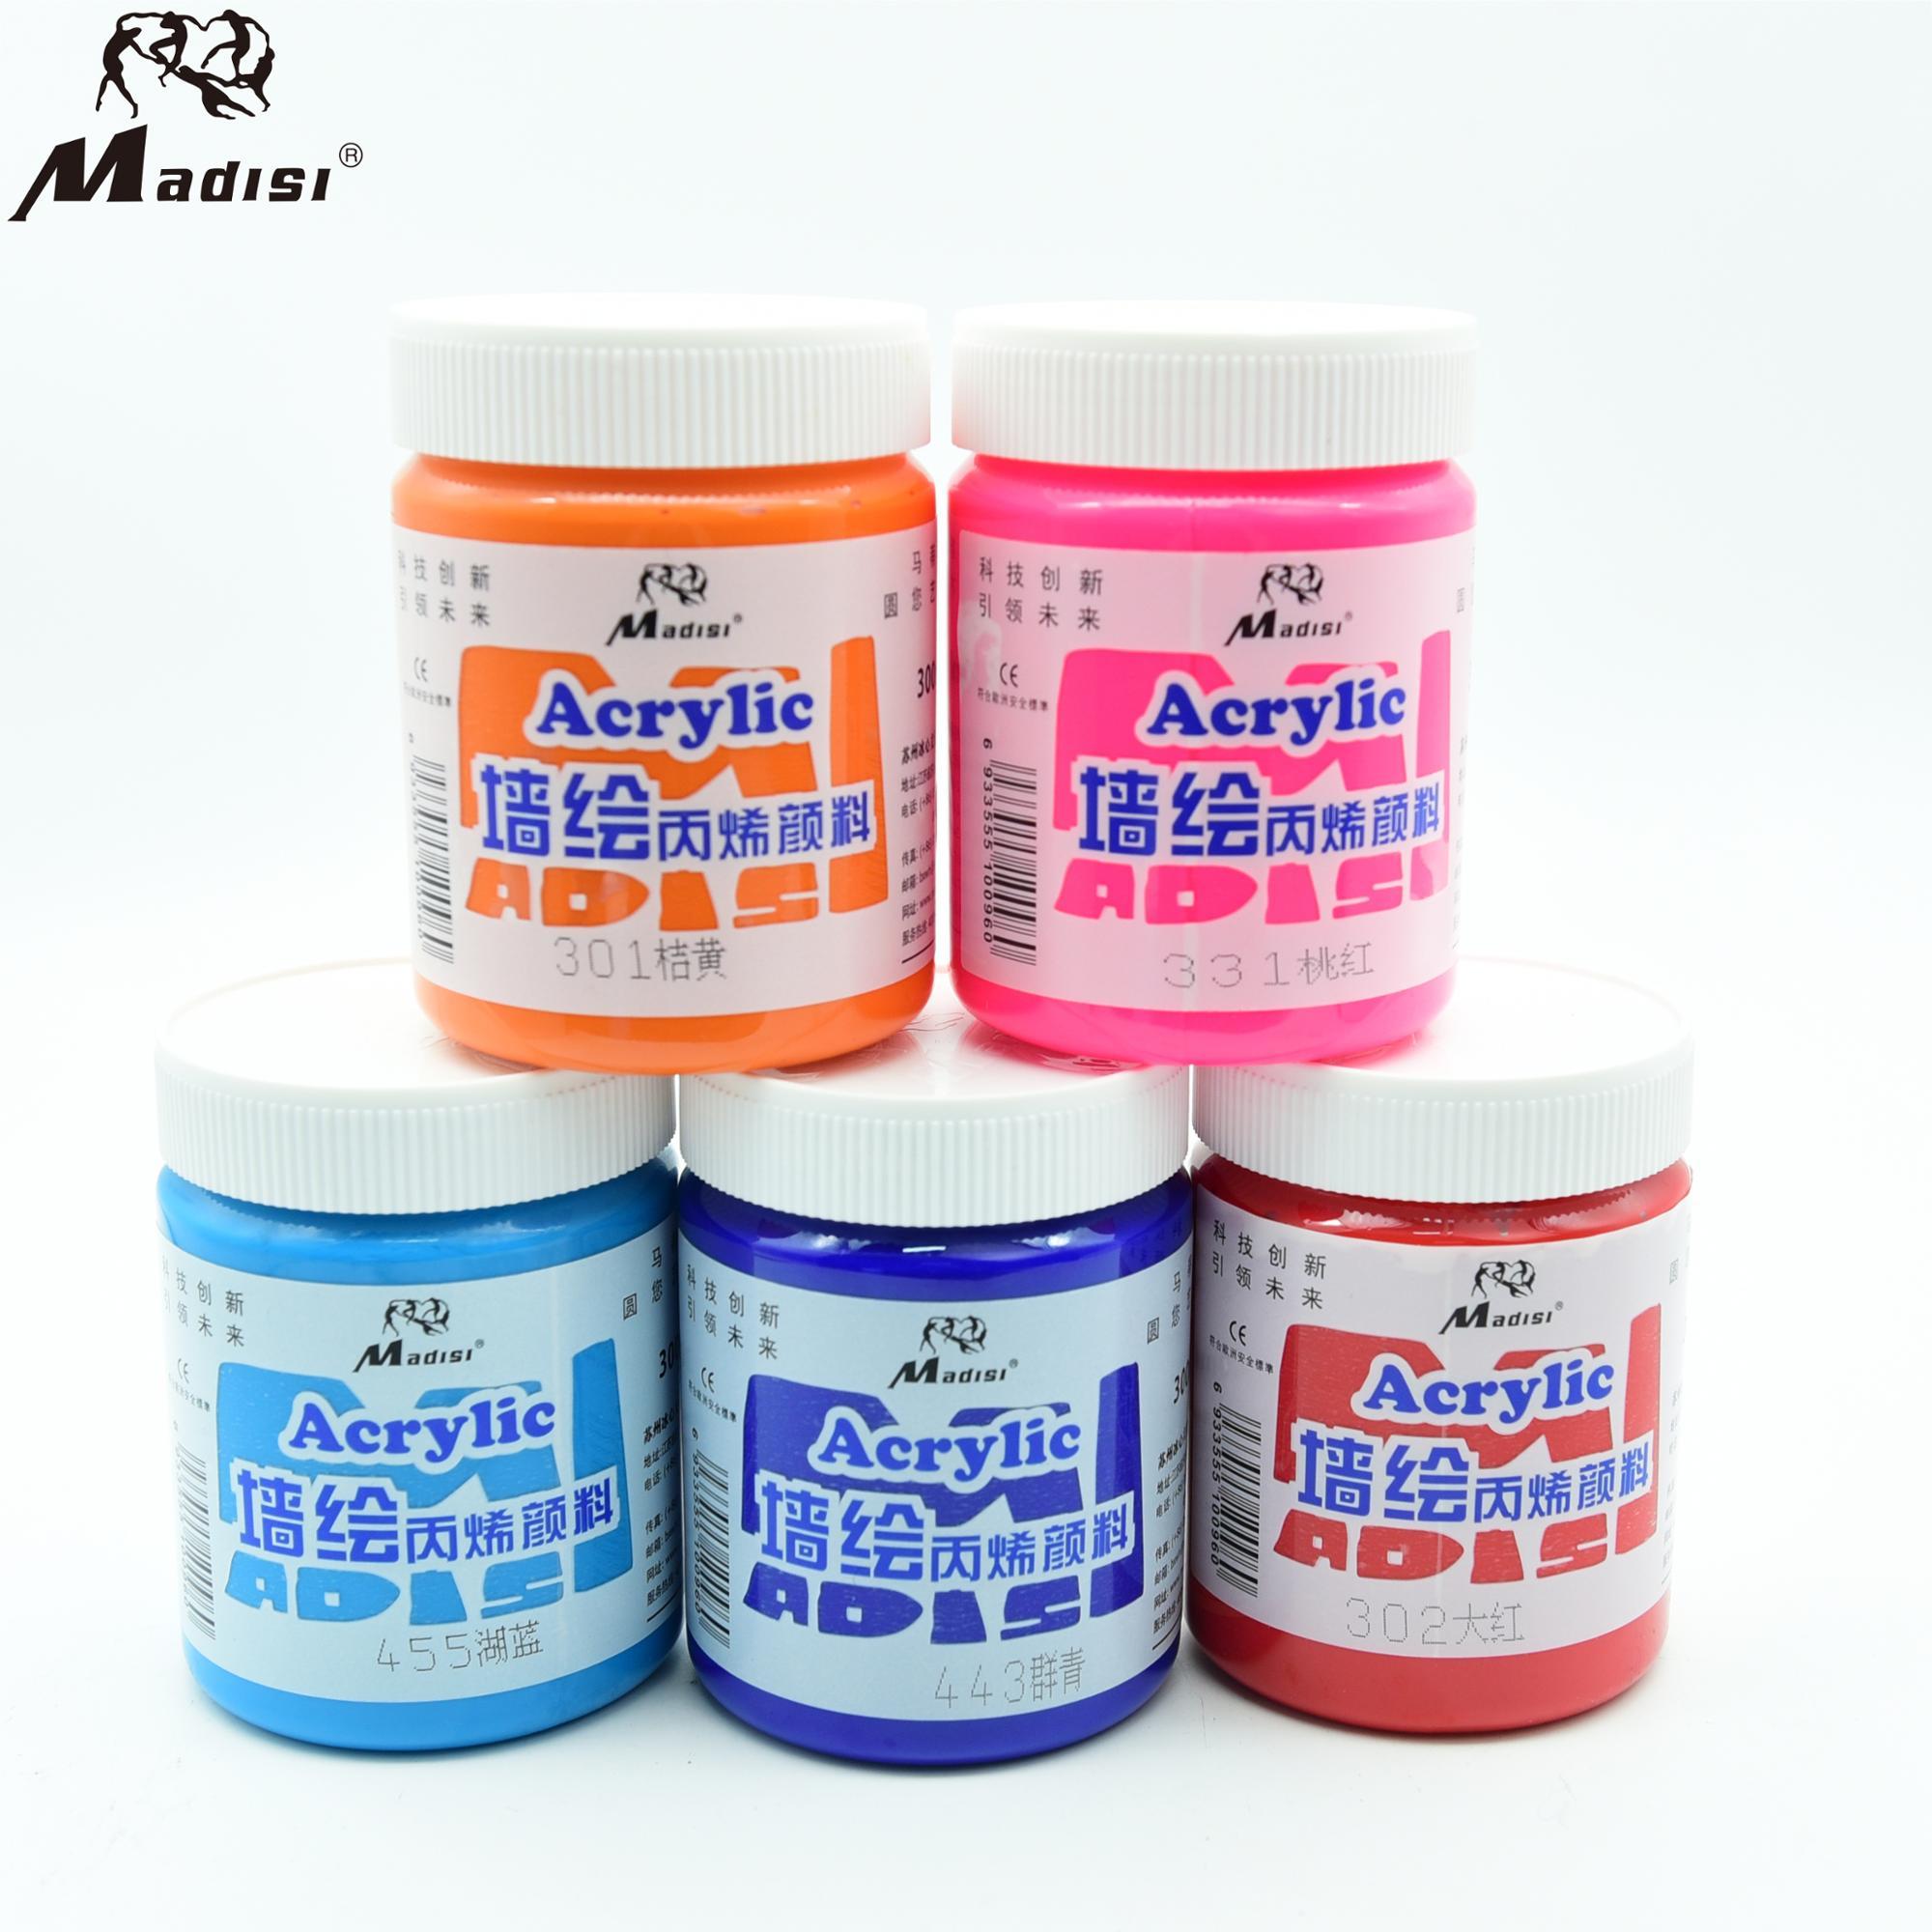 Hot Sale Non Toxic Artist Diy Acrylic Paint 300ml Buy Acrylic Paint Acrylic Paint 300ml Diy Acrylic Paint Product On Alibaba Com